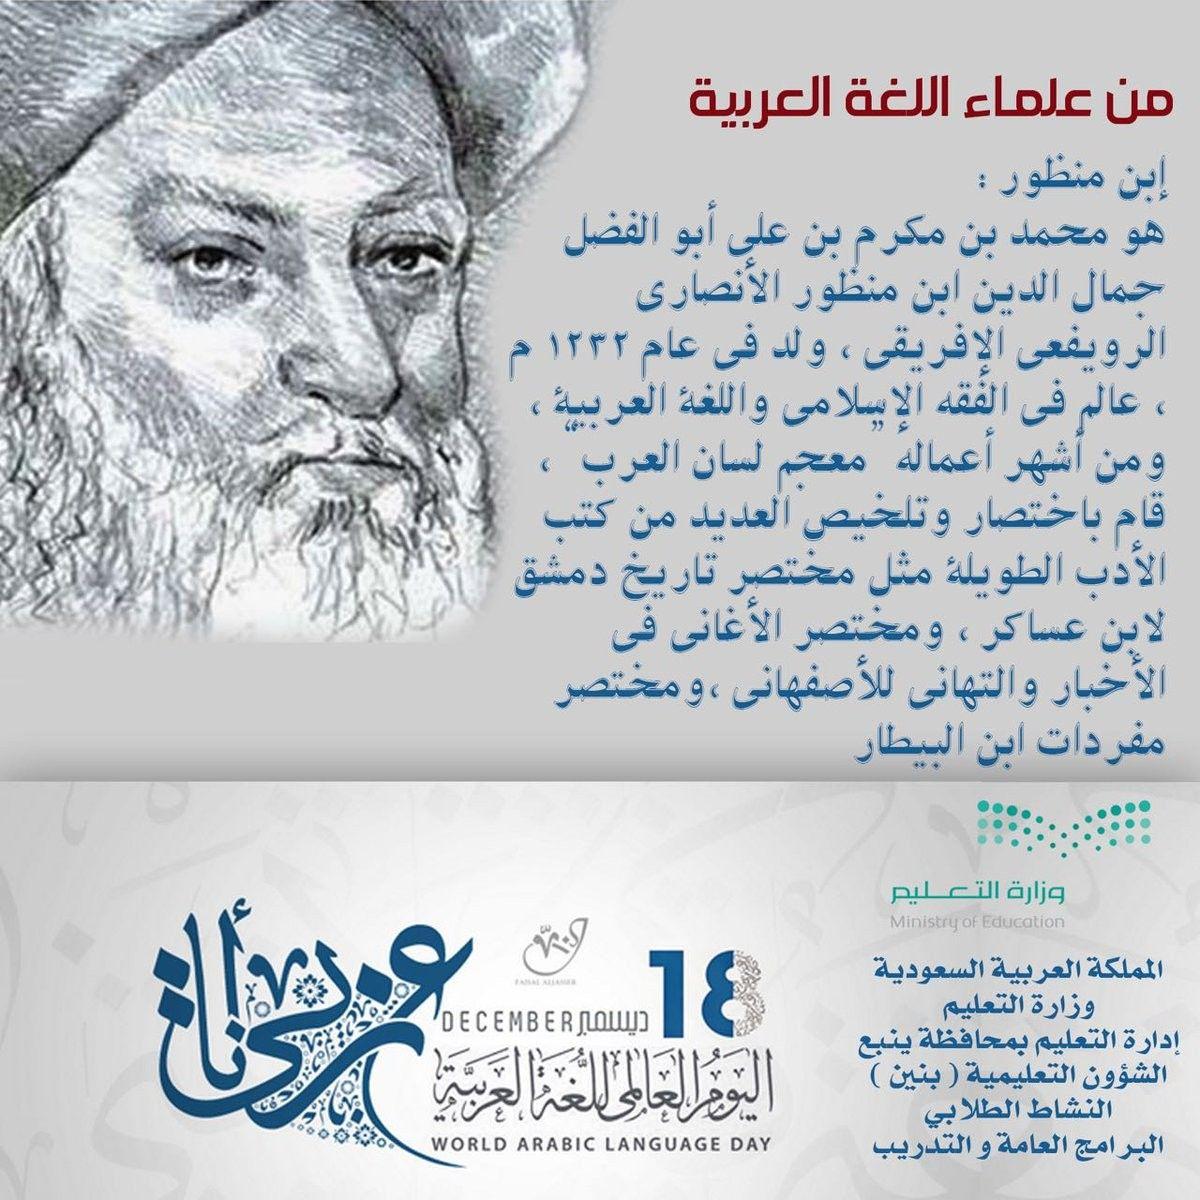 Pin By Soso On علماء اللغة العربية Arabic Language Arabic Quotes Language